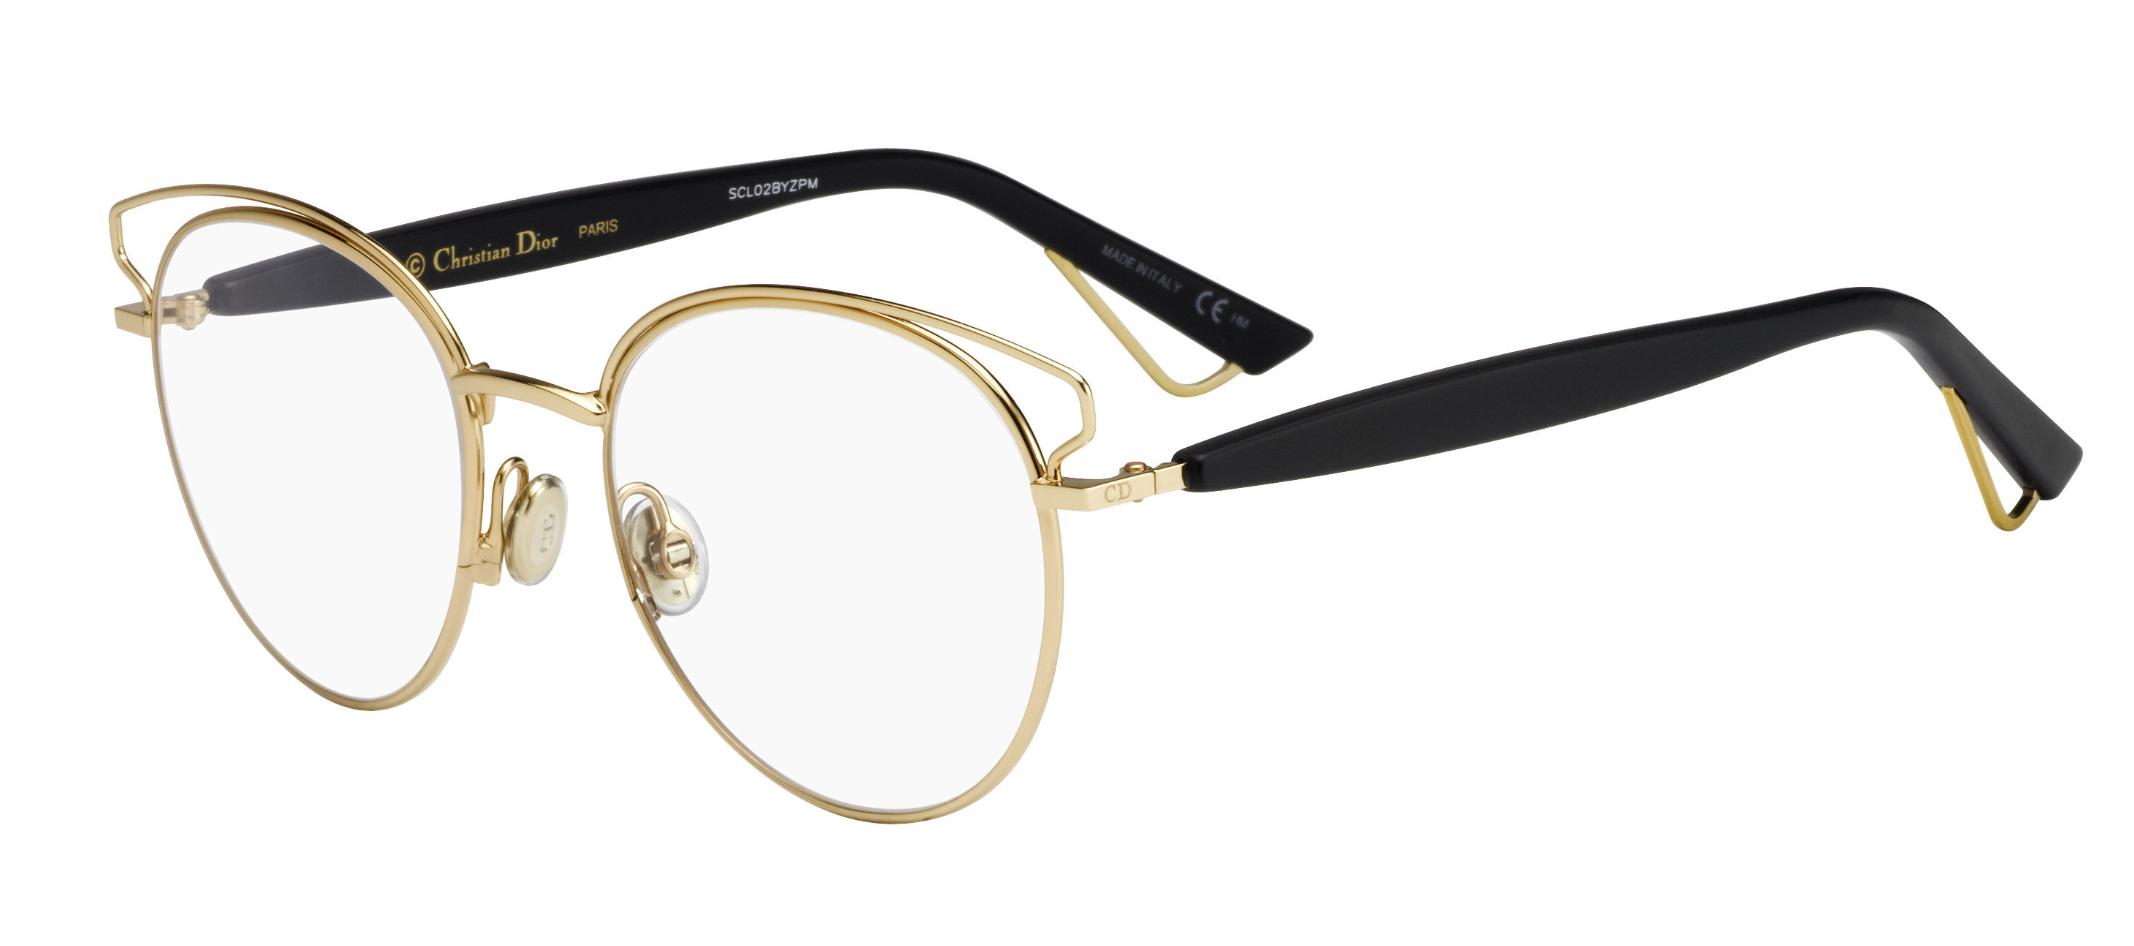 c7b6f1e526 Dior Sideral O 0DEM Round Eyeglasses